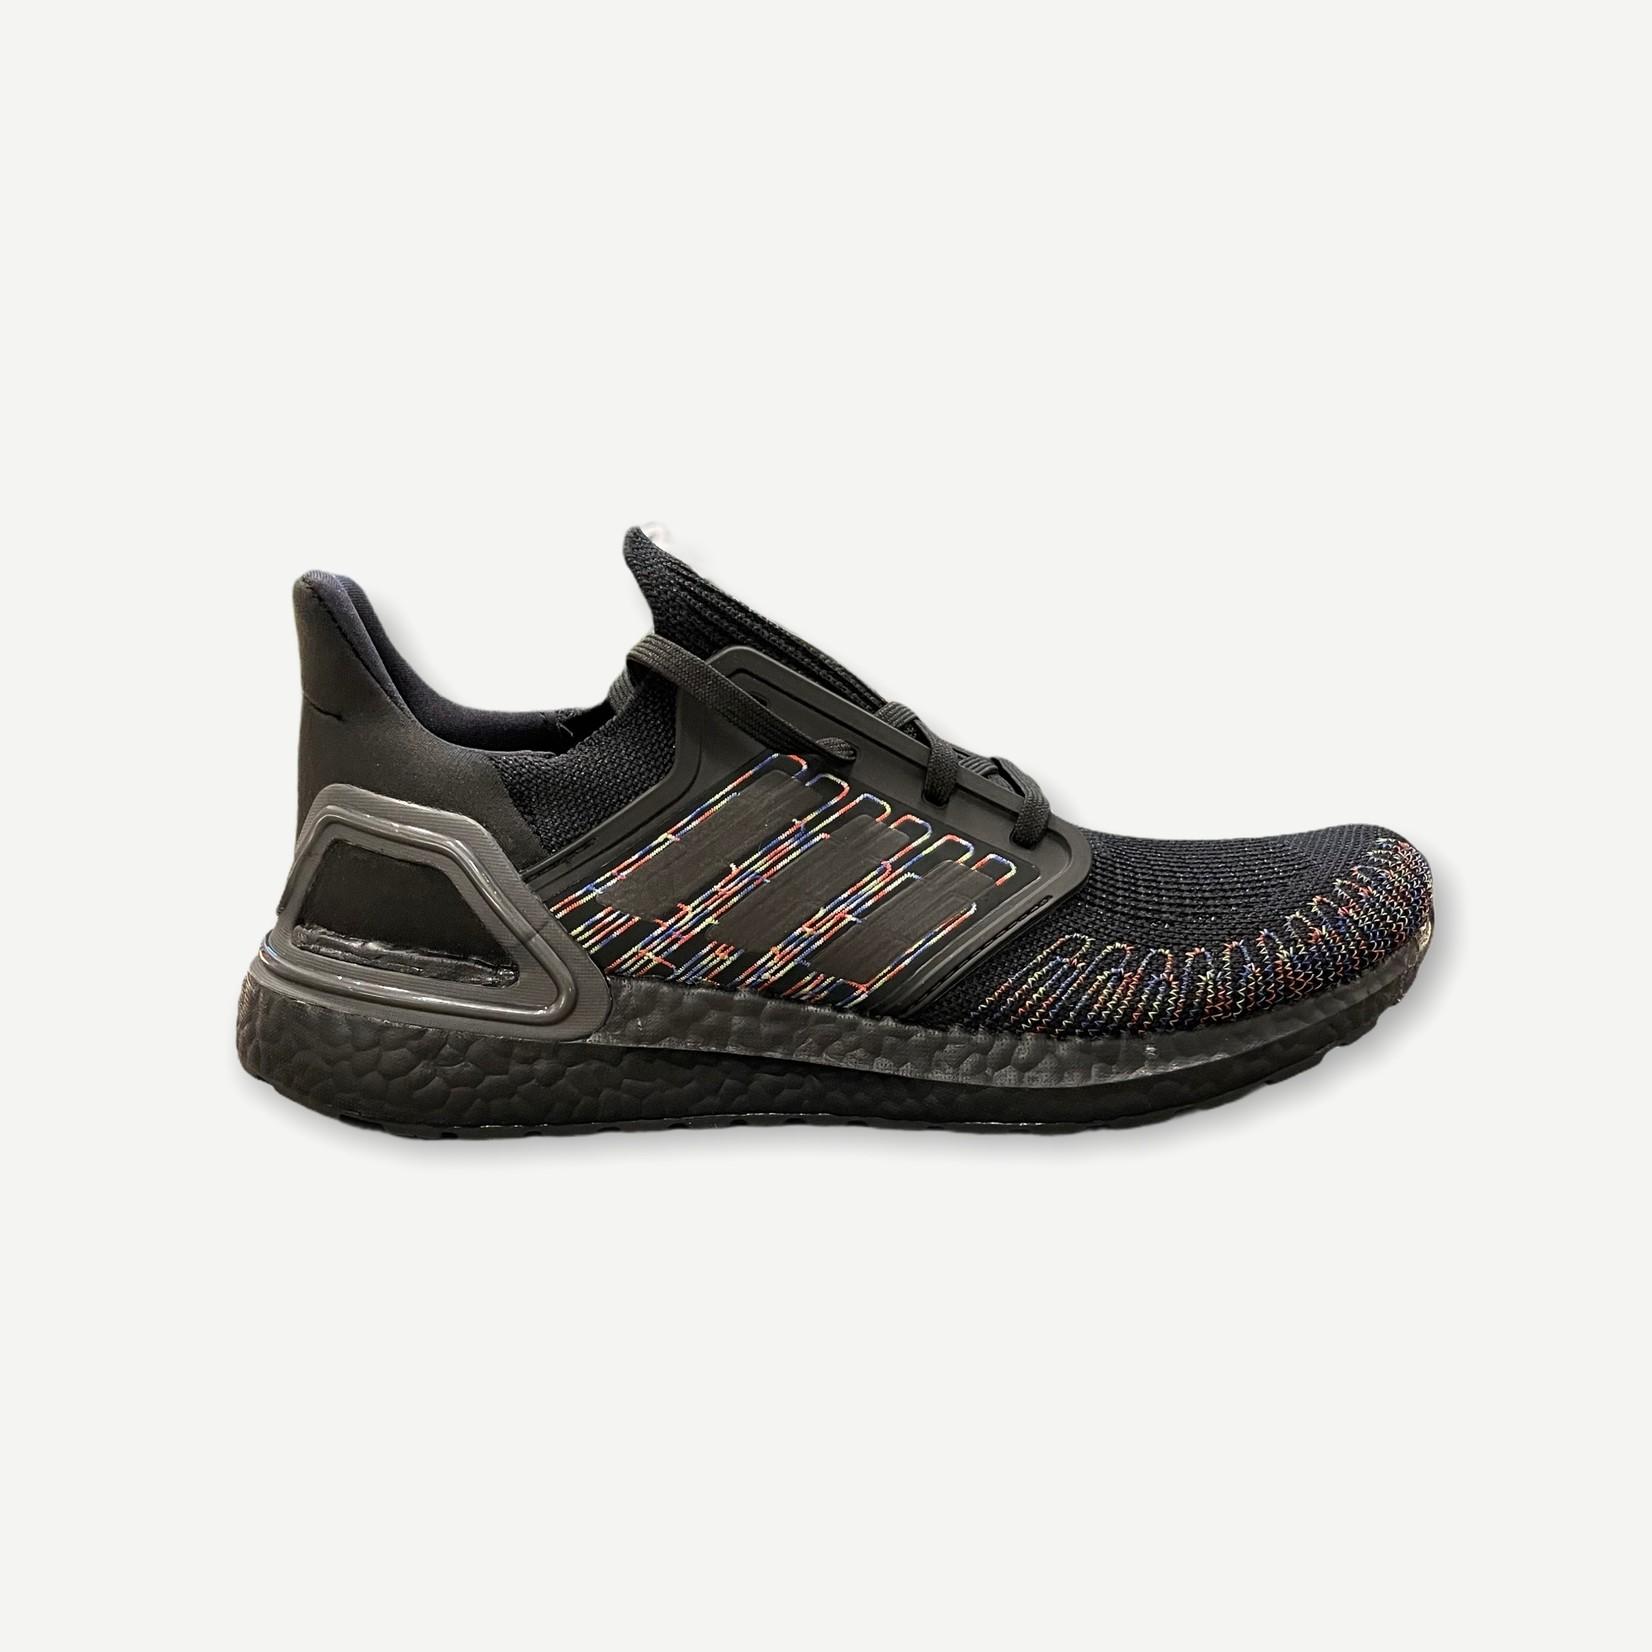 Adidas MensUltraboost 20